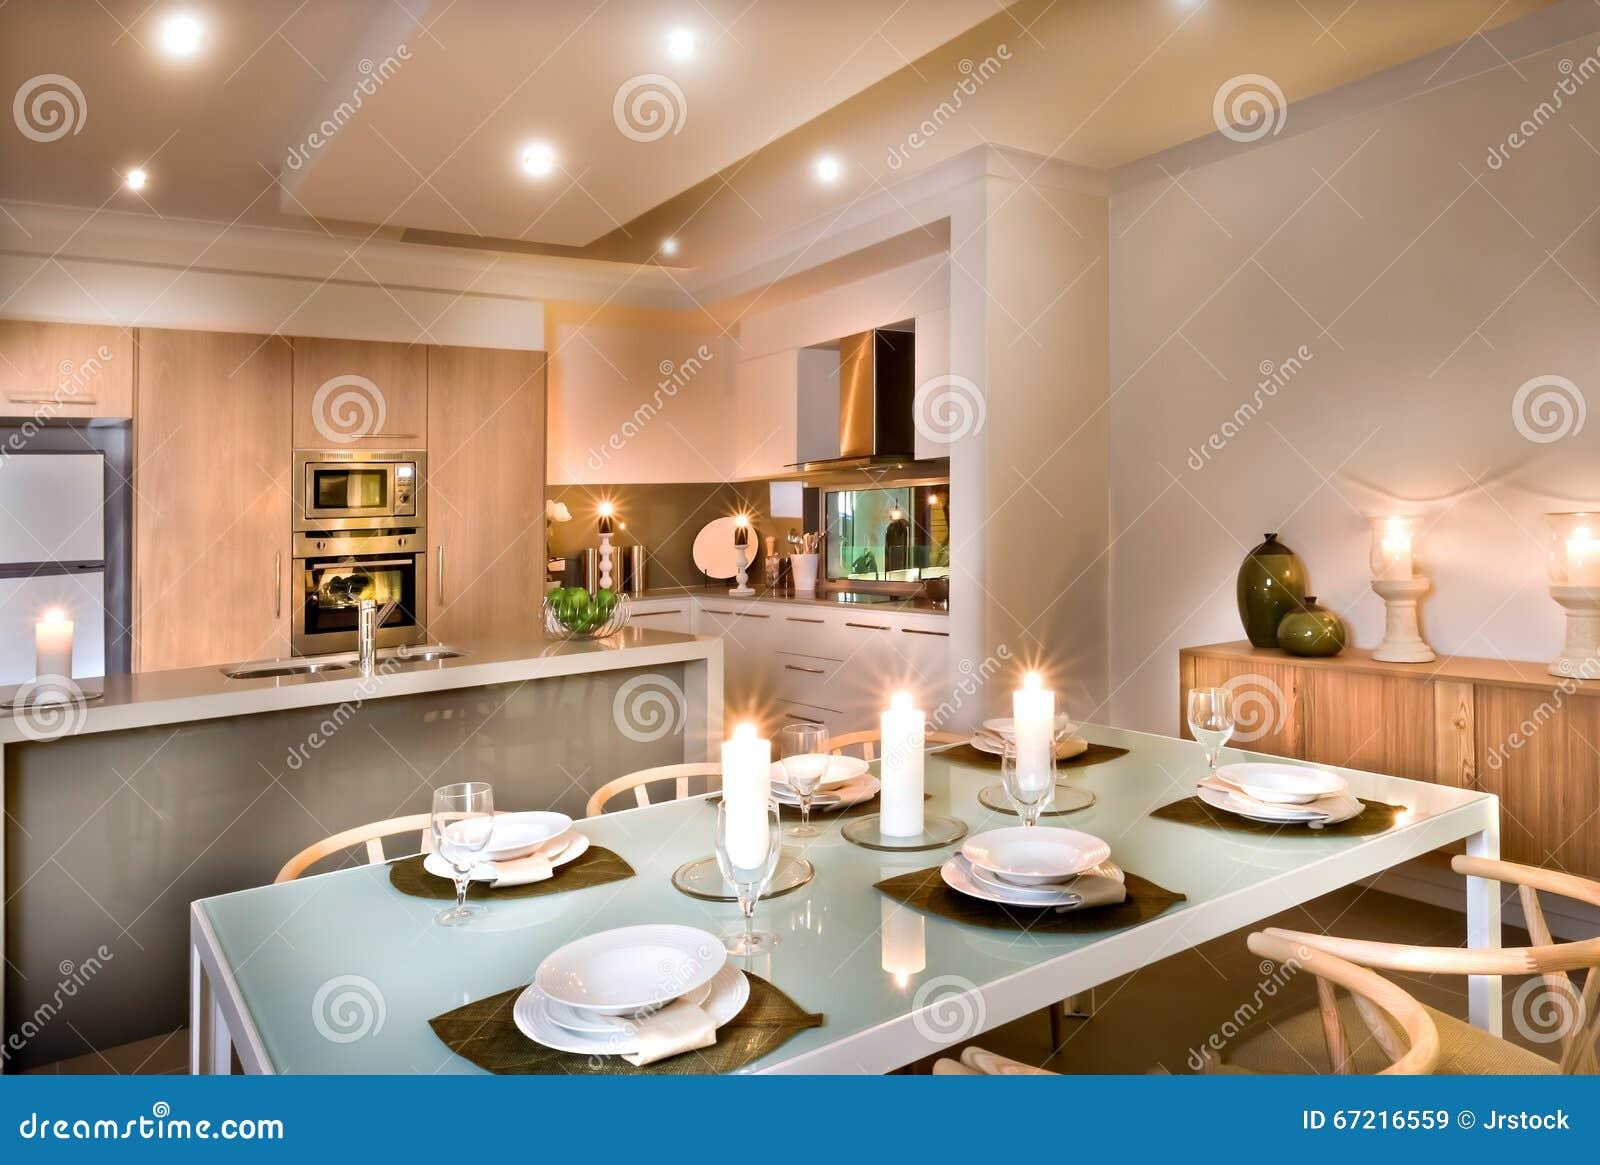 Sala e cucina insieme come arredare jy15 regardsdefemmes for Sala da pranzo versace